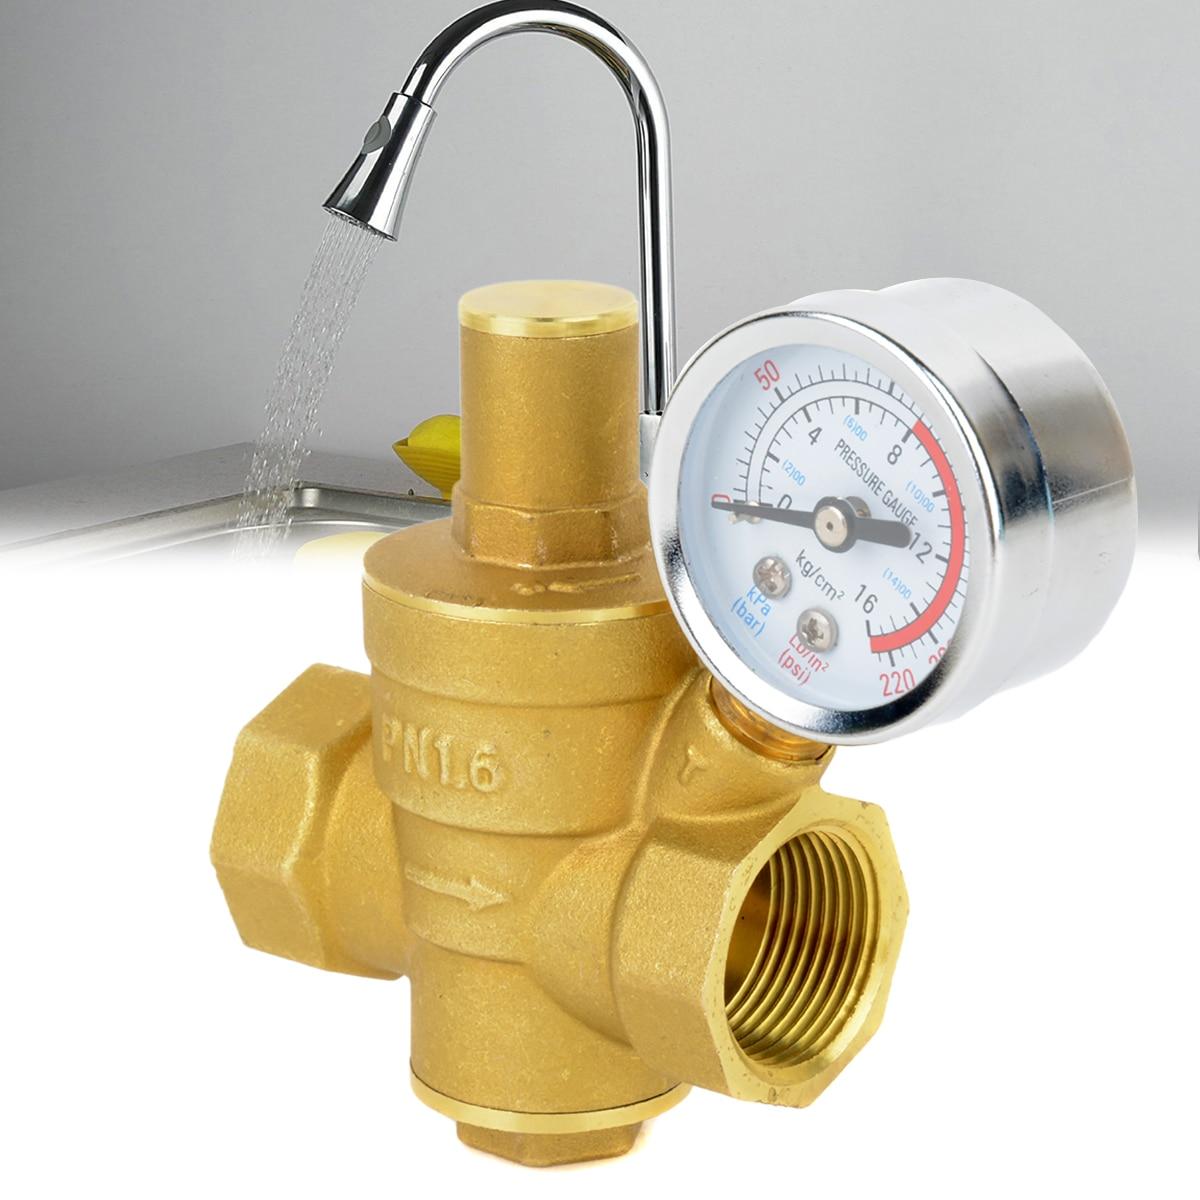 1//2 Brass Water Pressure Regulator Relief Valve Pressure Reducing Regulator Valve Water Flow Valve with Guage Pressure Reducing Valve